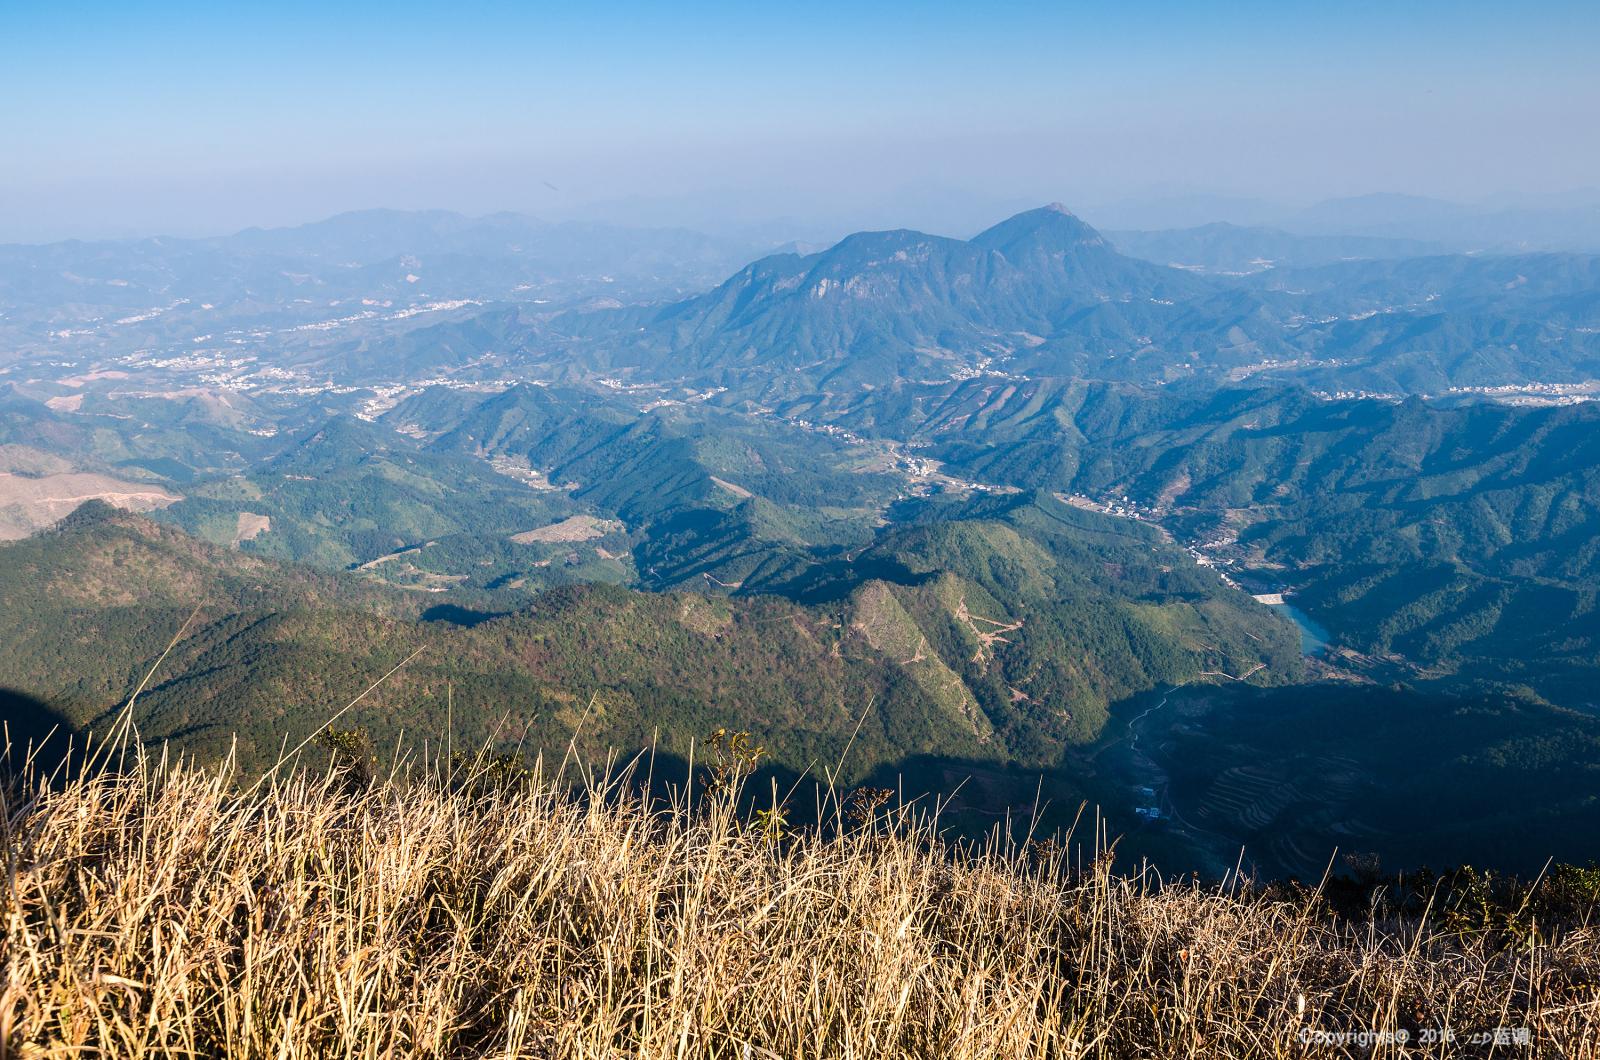 Tianlongding Mountain Park